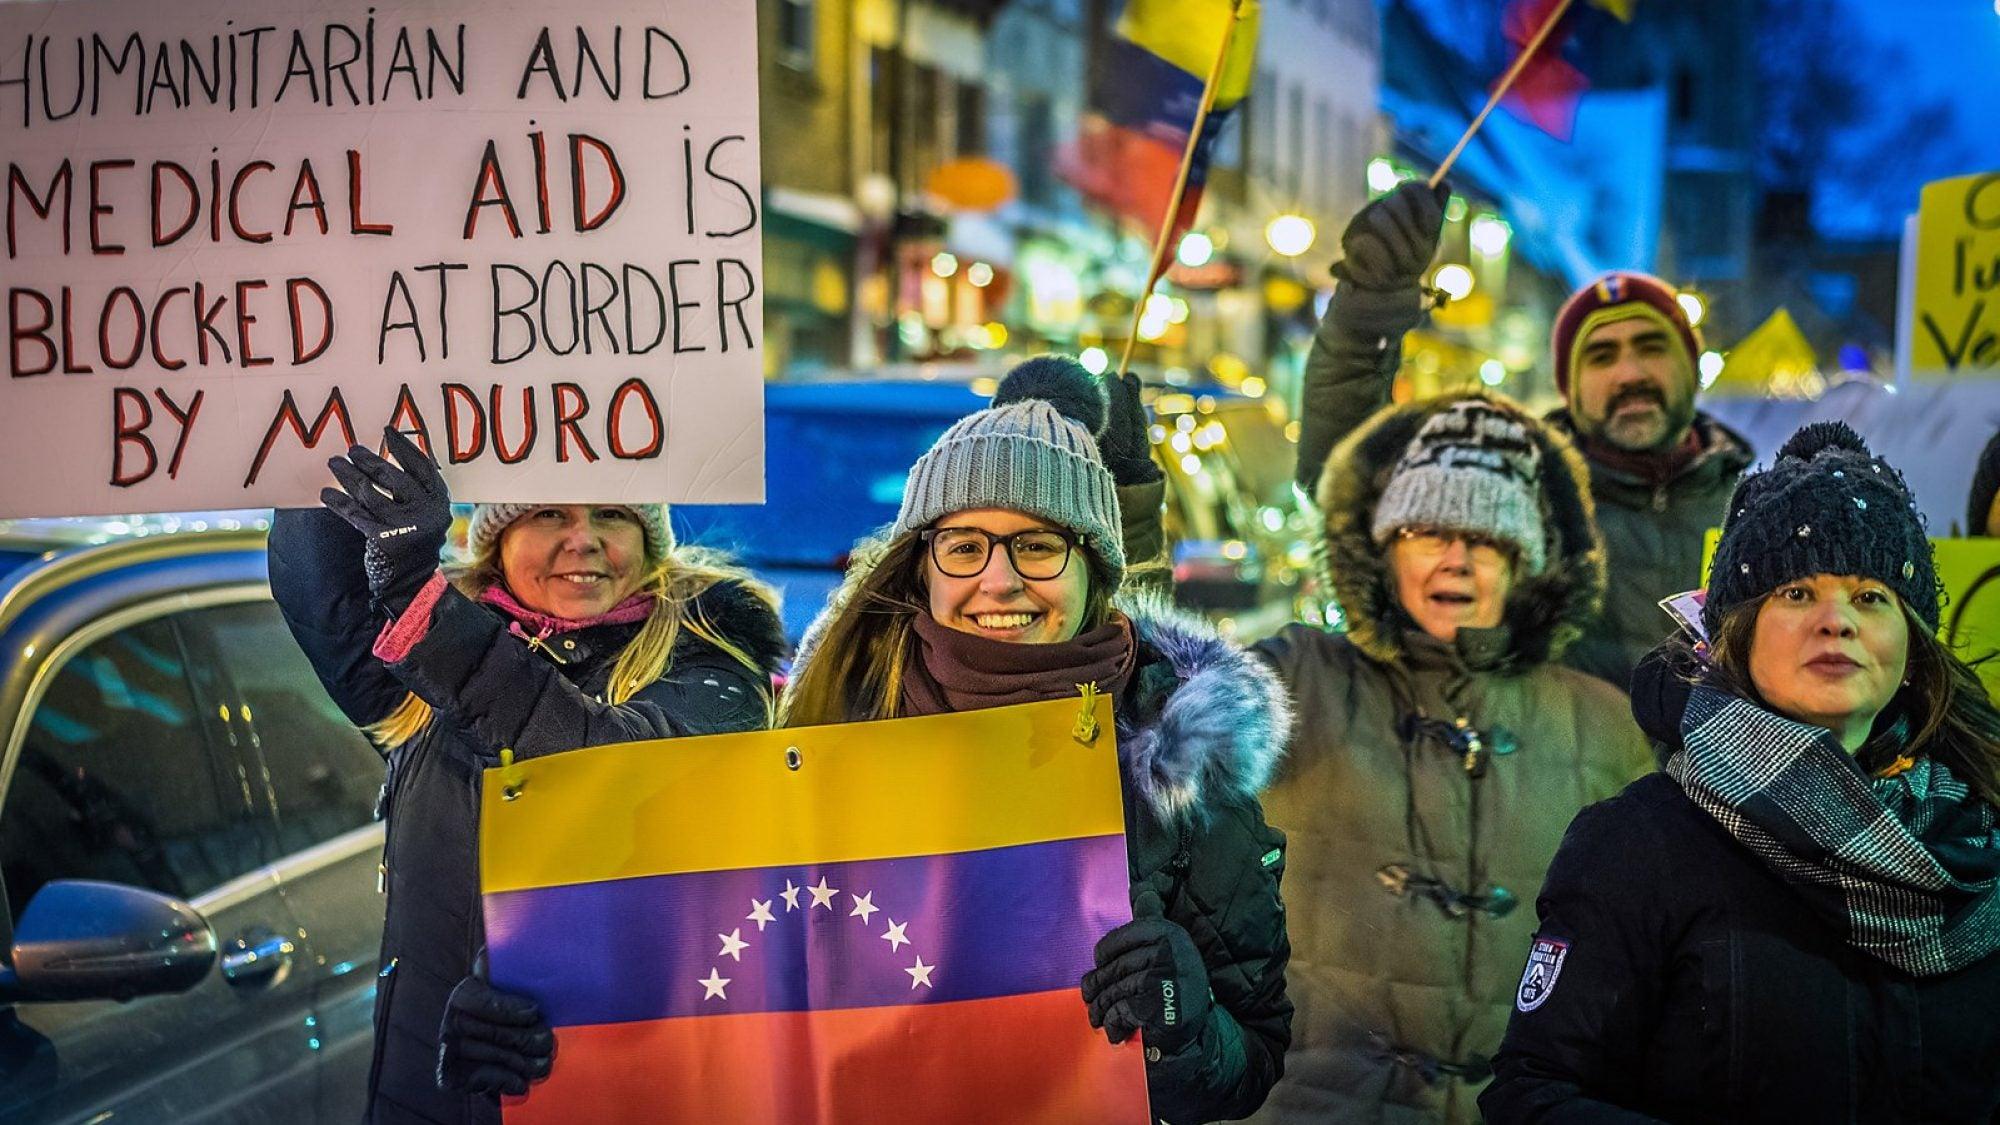 Venezuelan Protestors in Quebec